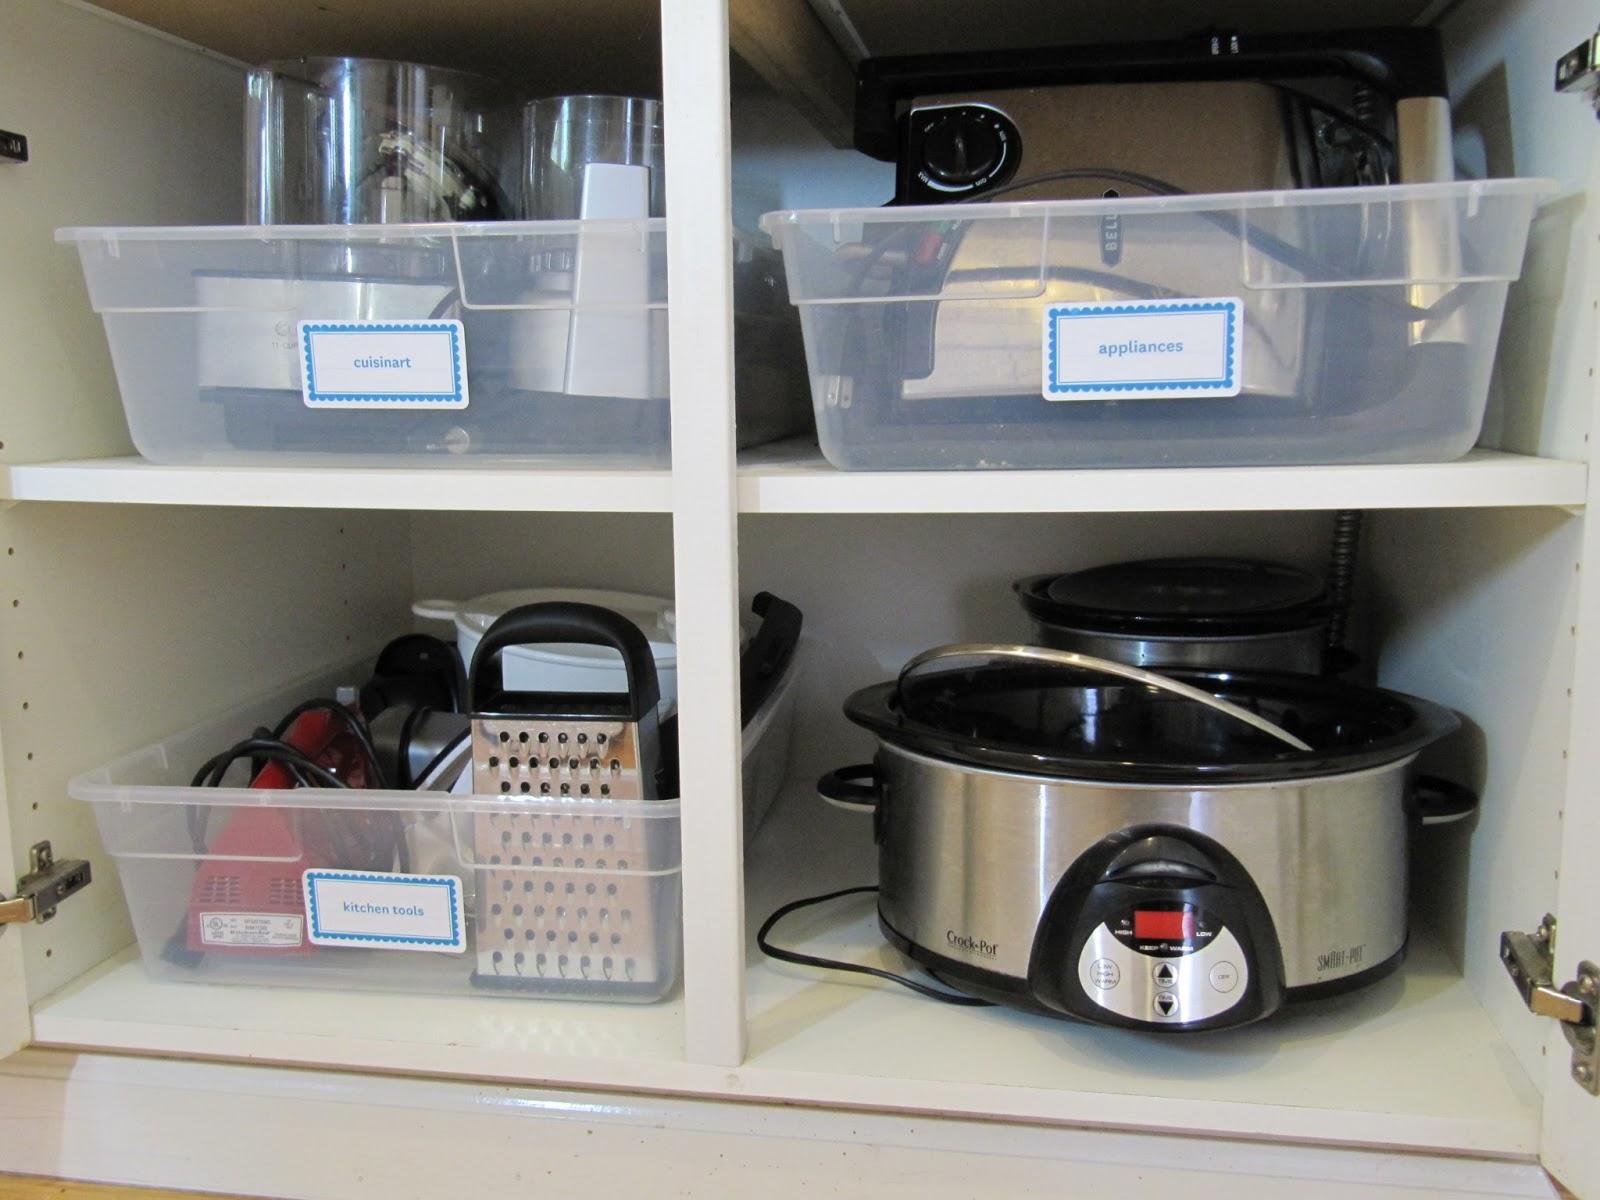 How To Organize Appliances In Kitchen